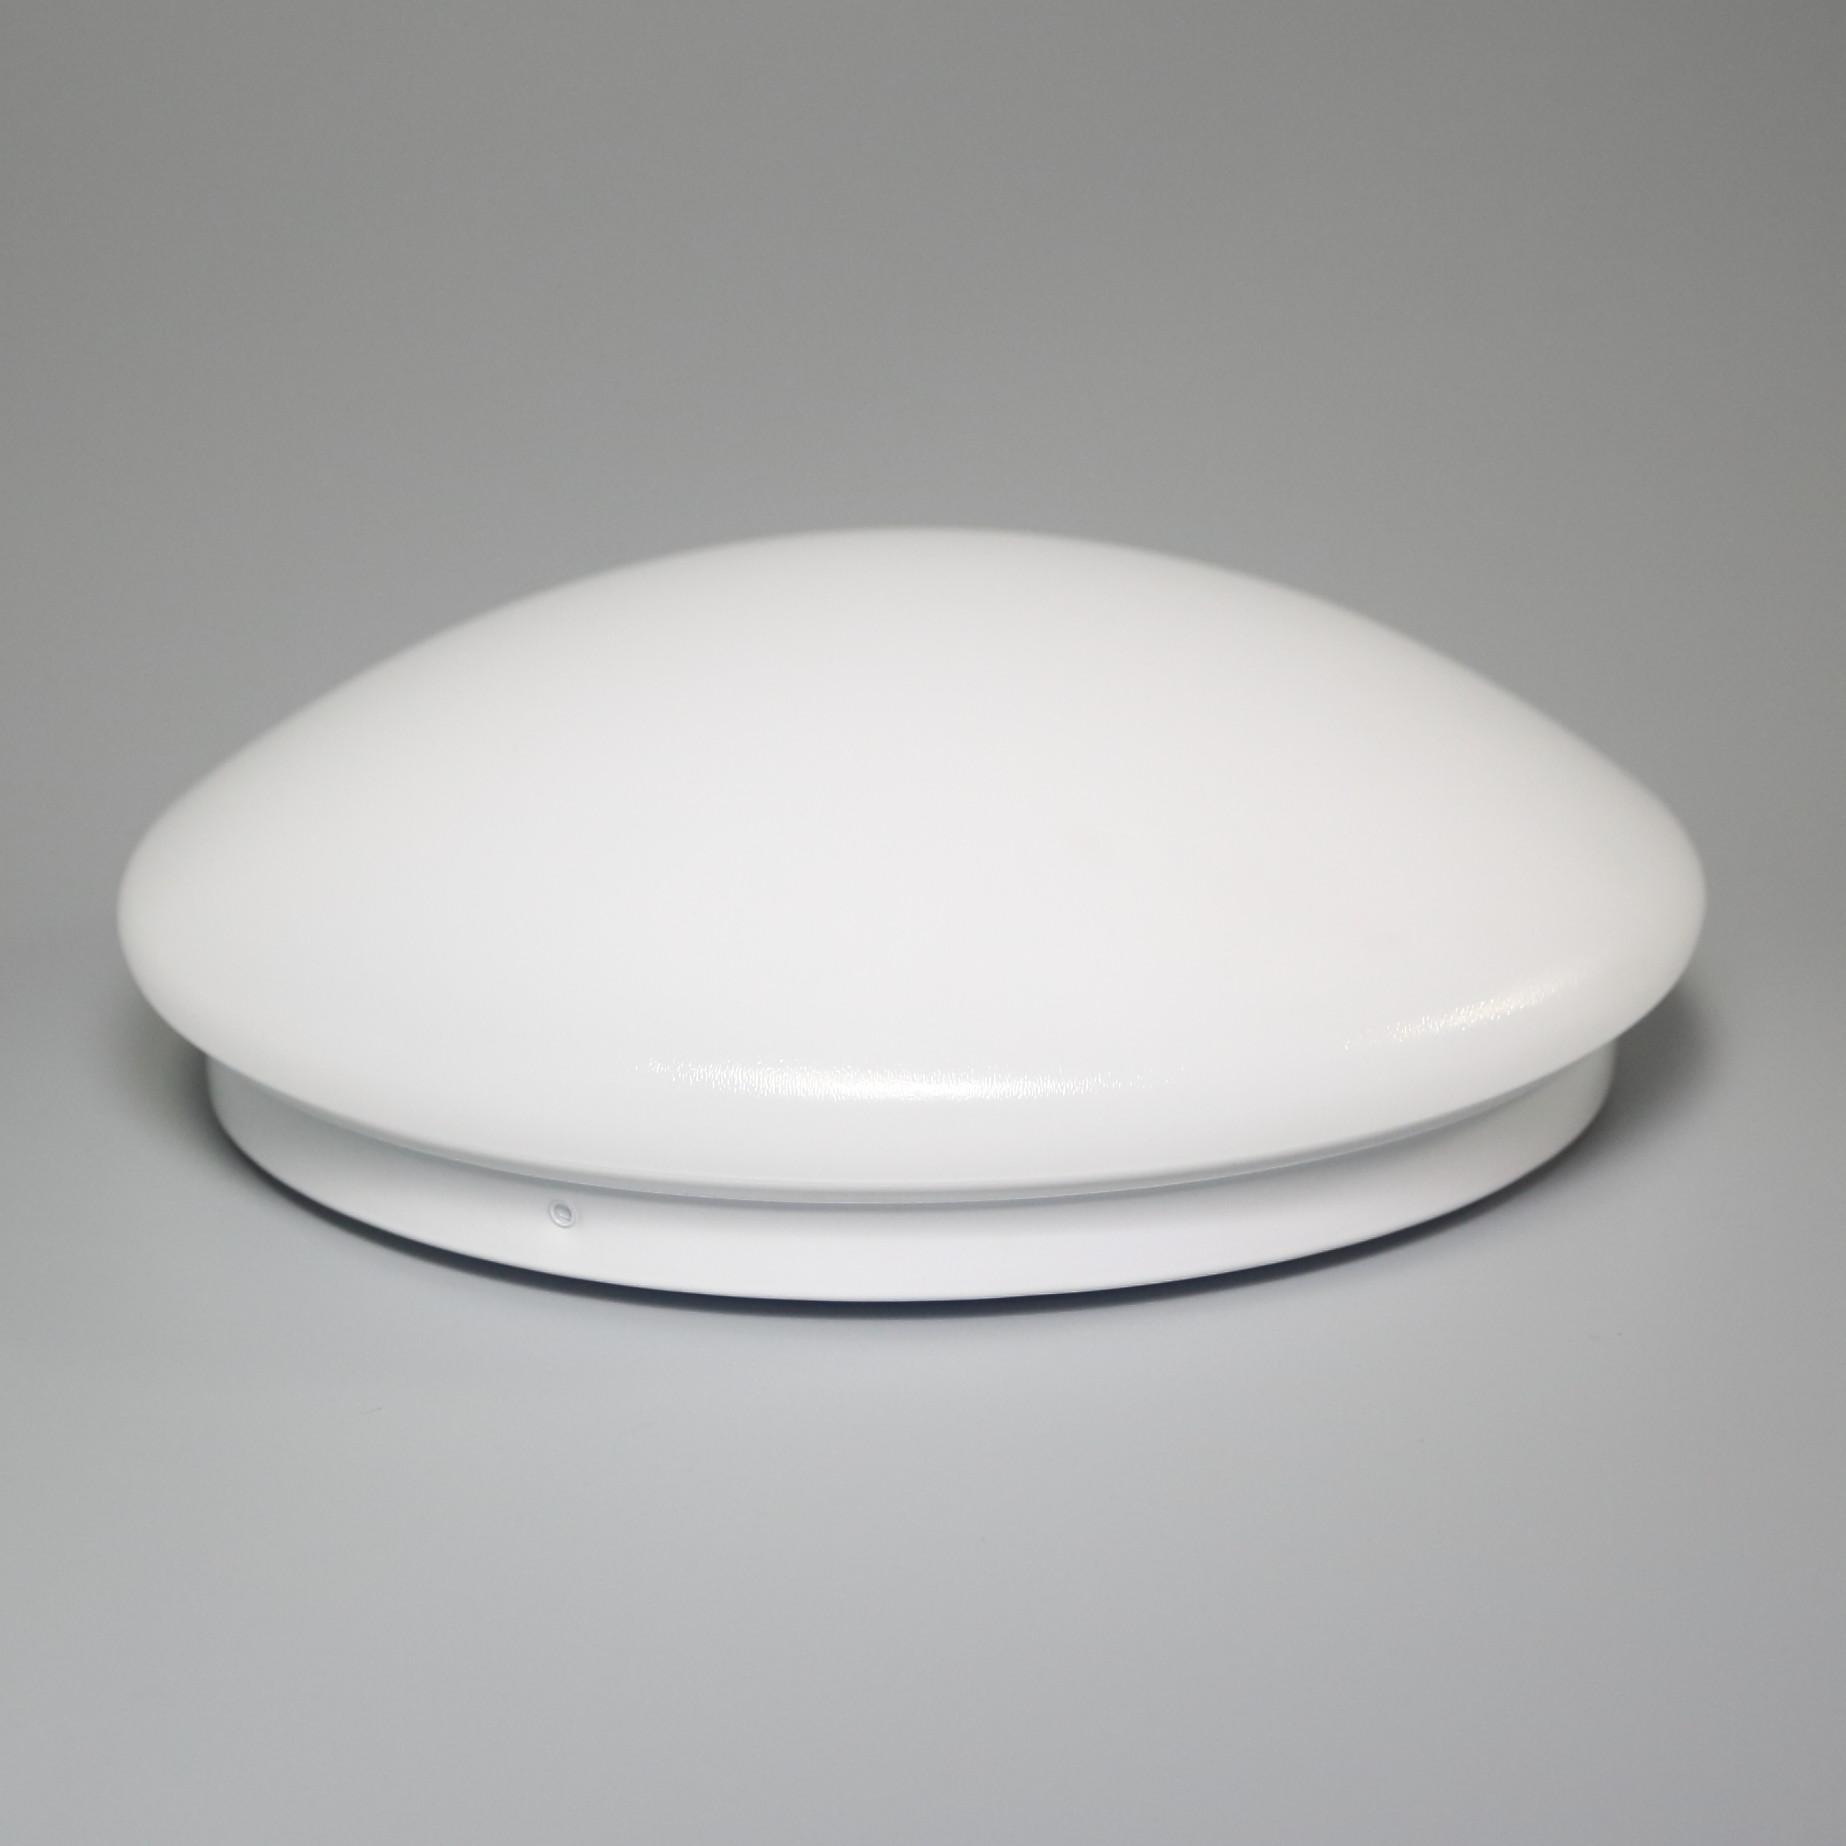 LED plafonnière plafondlamp 12v, 24v, 10-30v